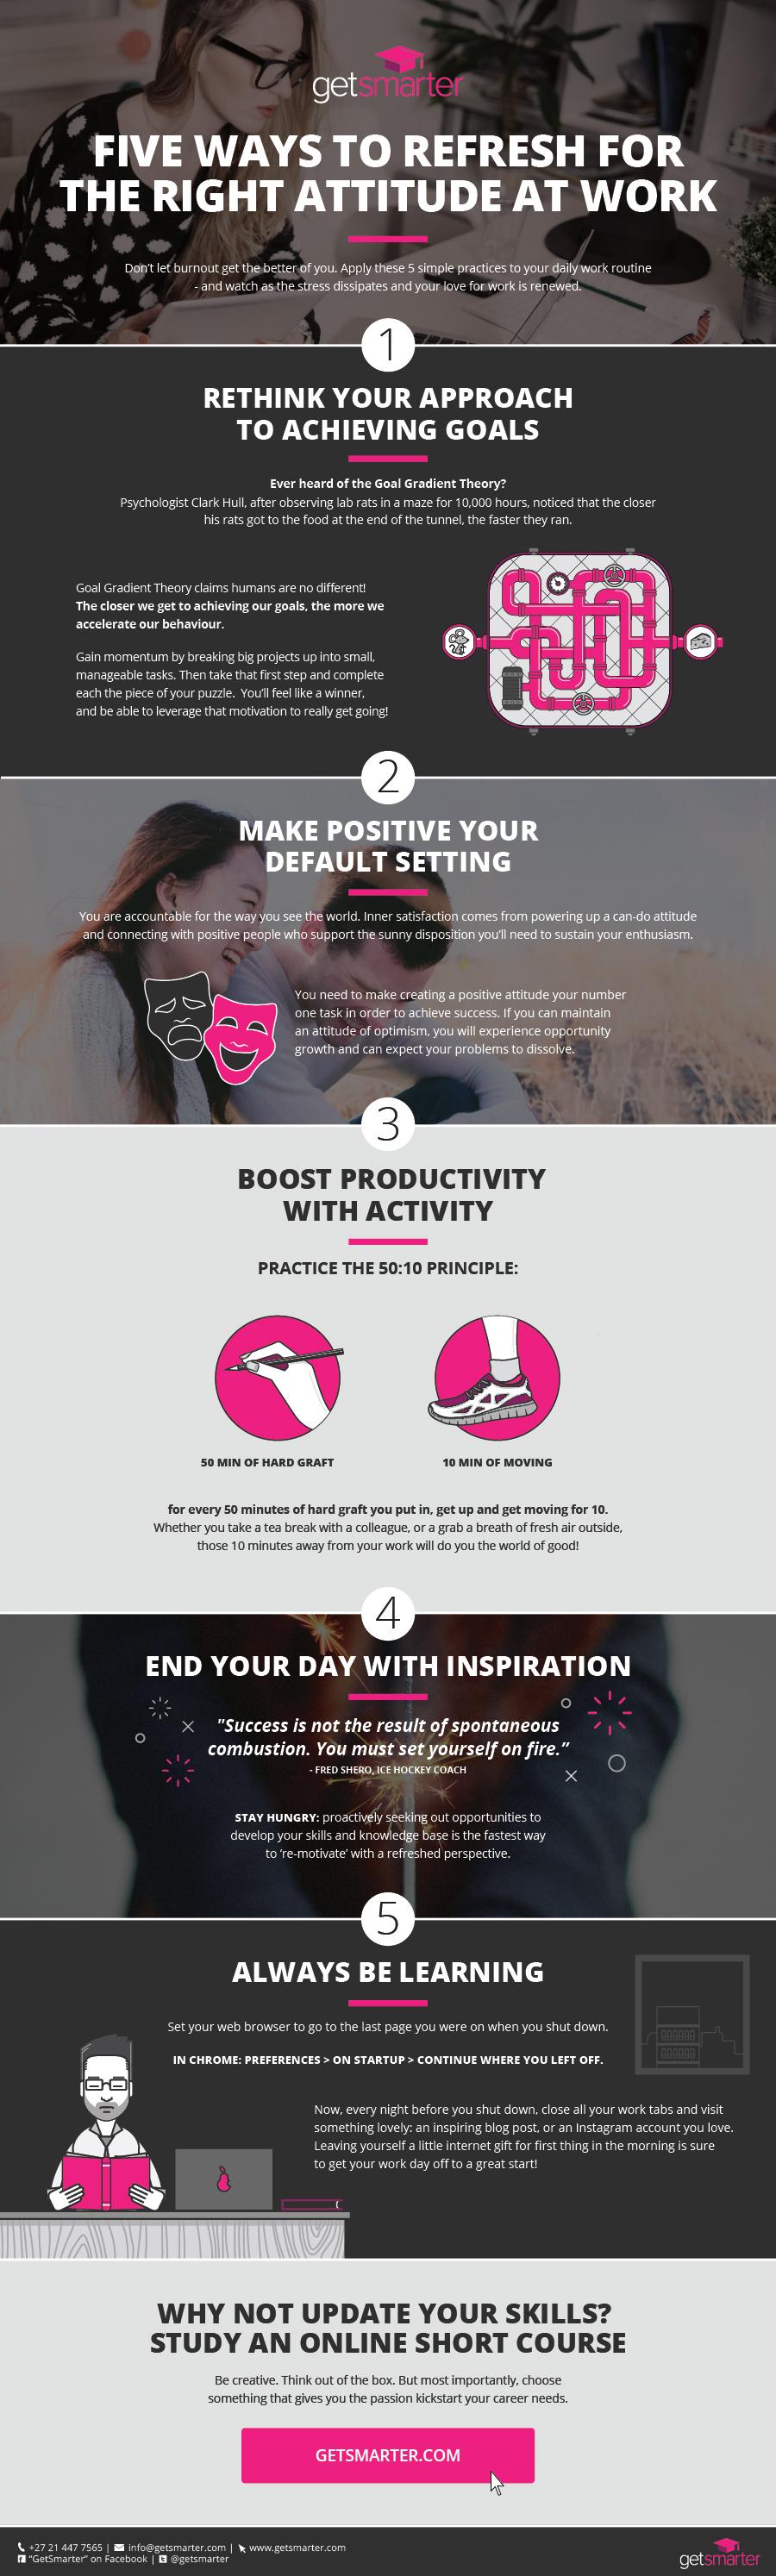 Motivation-Planning-Productivity-Prioritisation